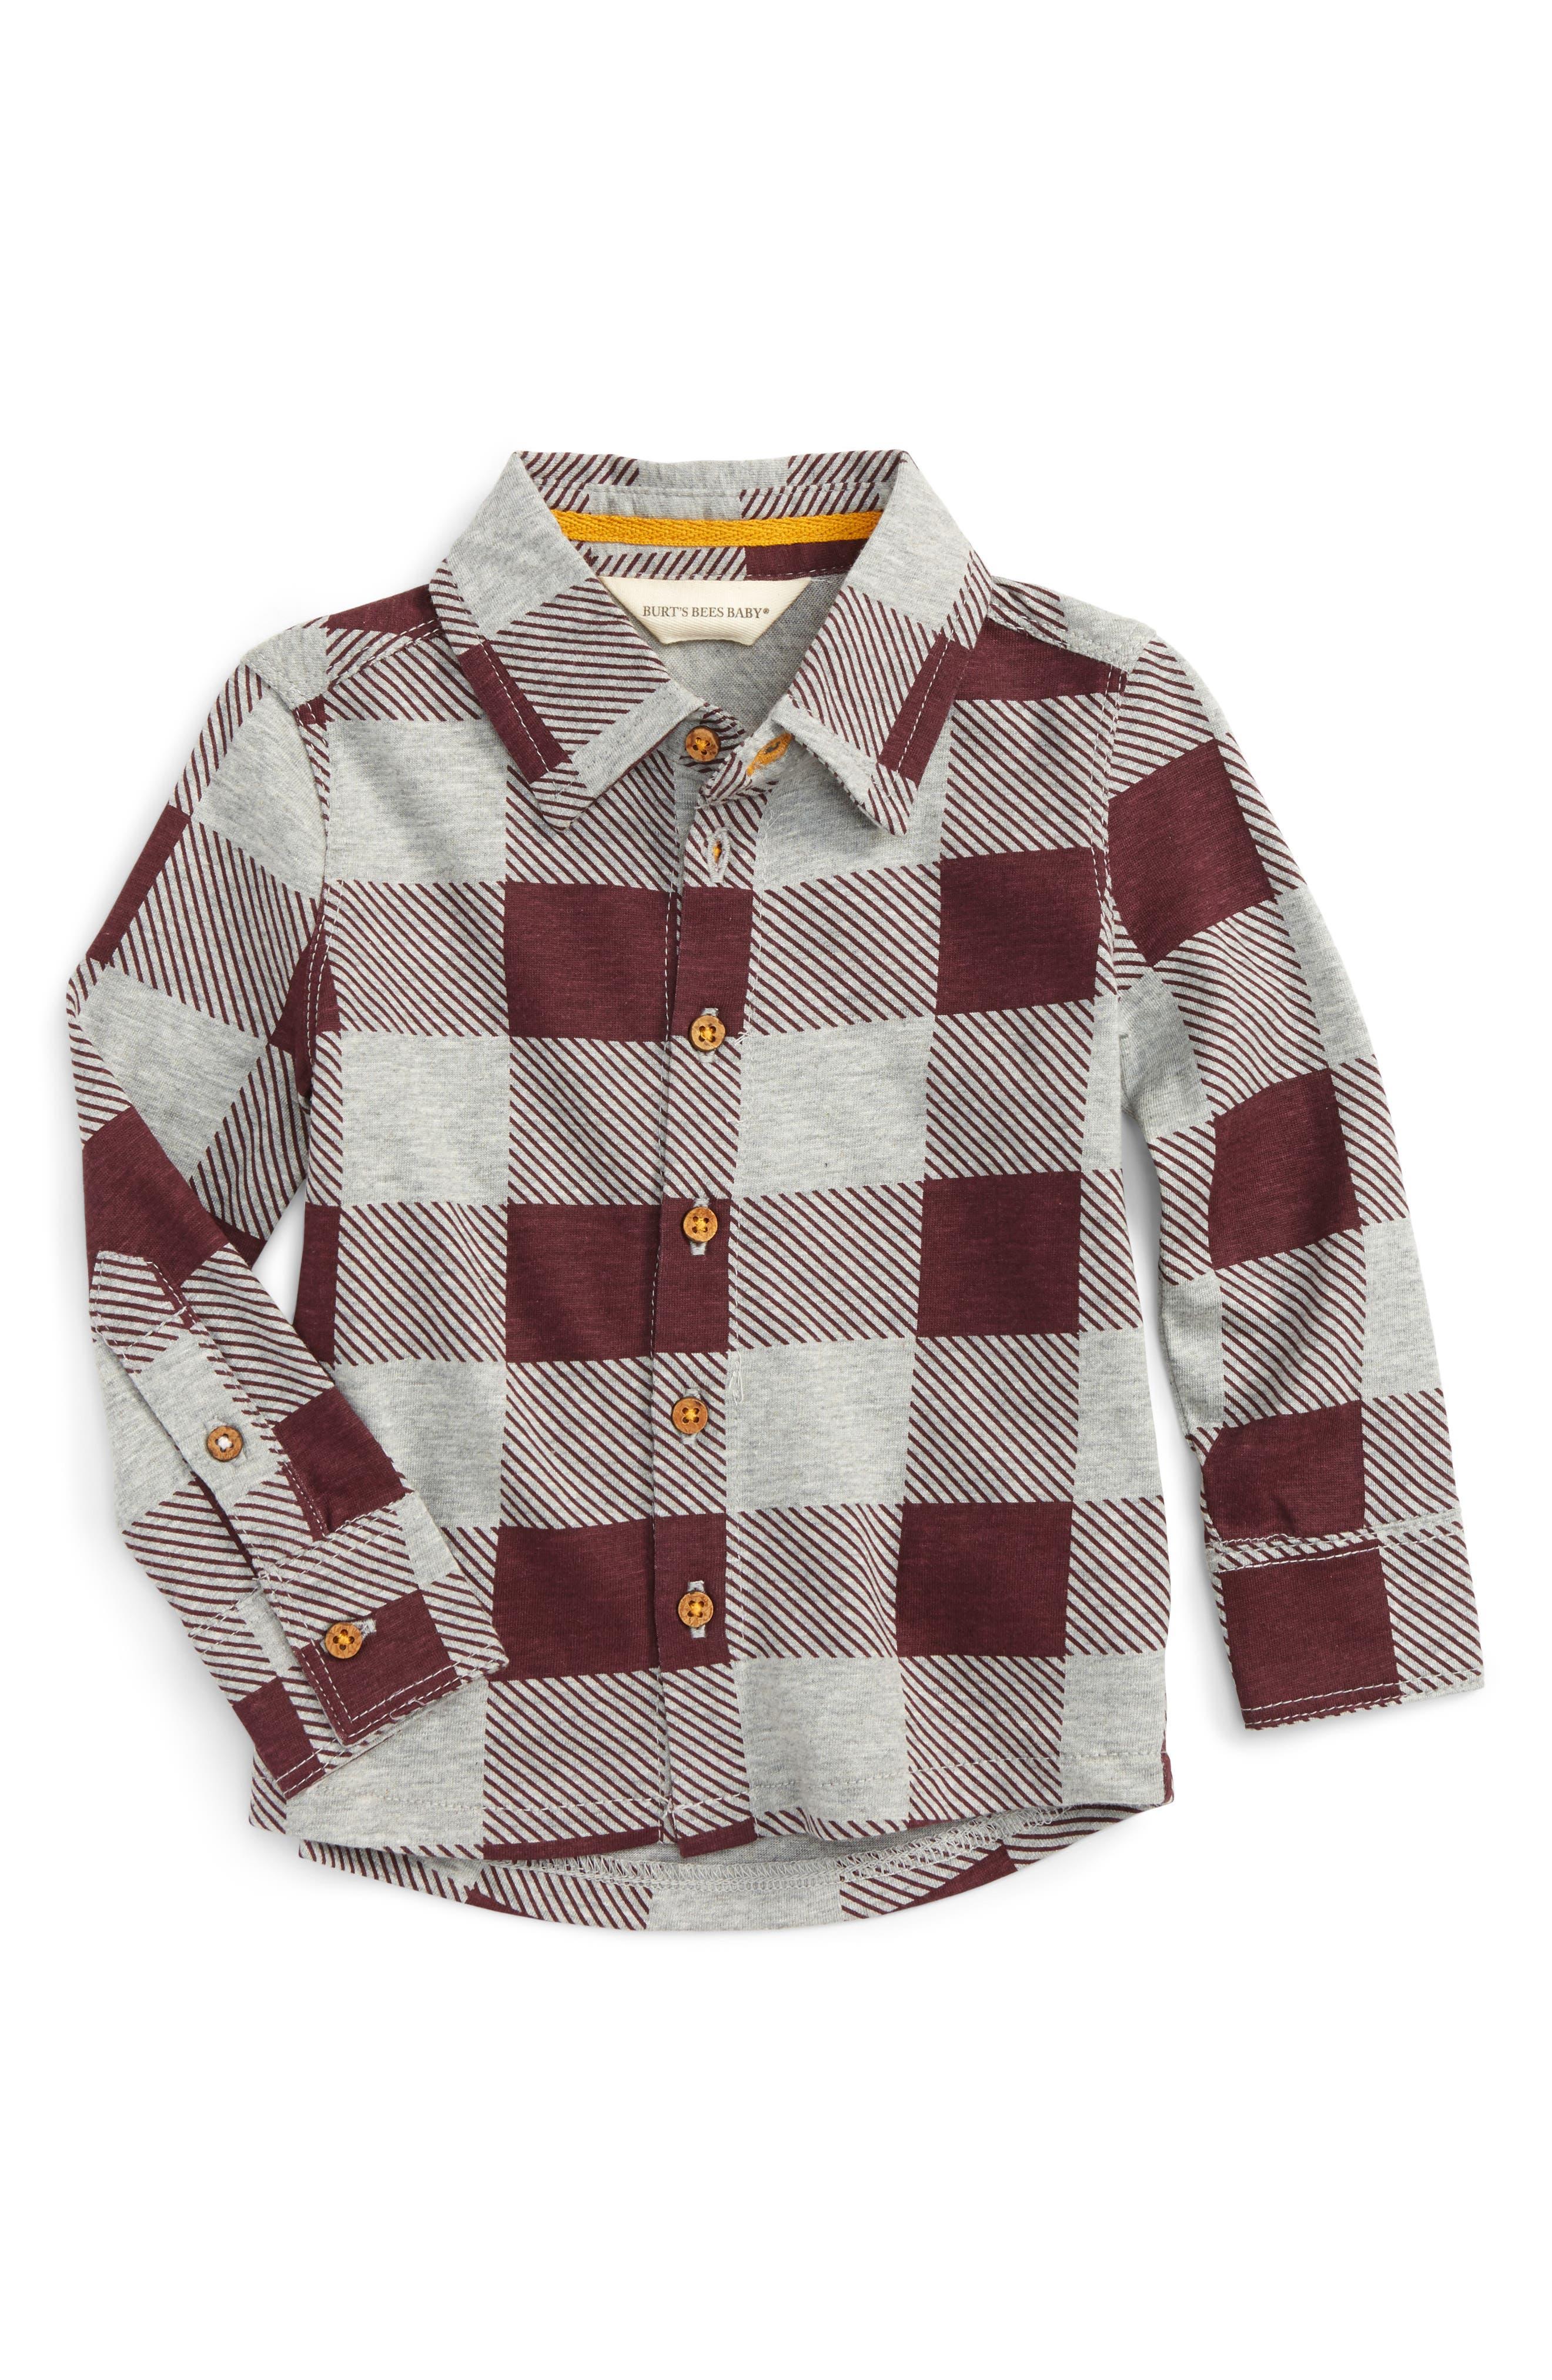 Burt's Bees Baby Buffalo Check Organic Cotton Shirt (Baby Boys)